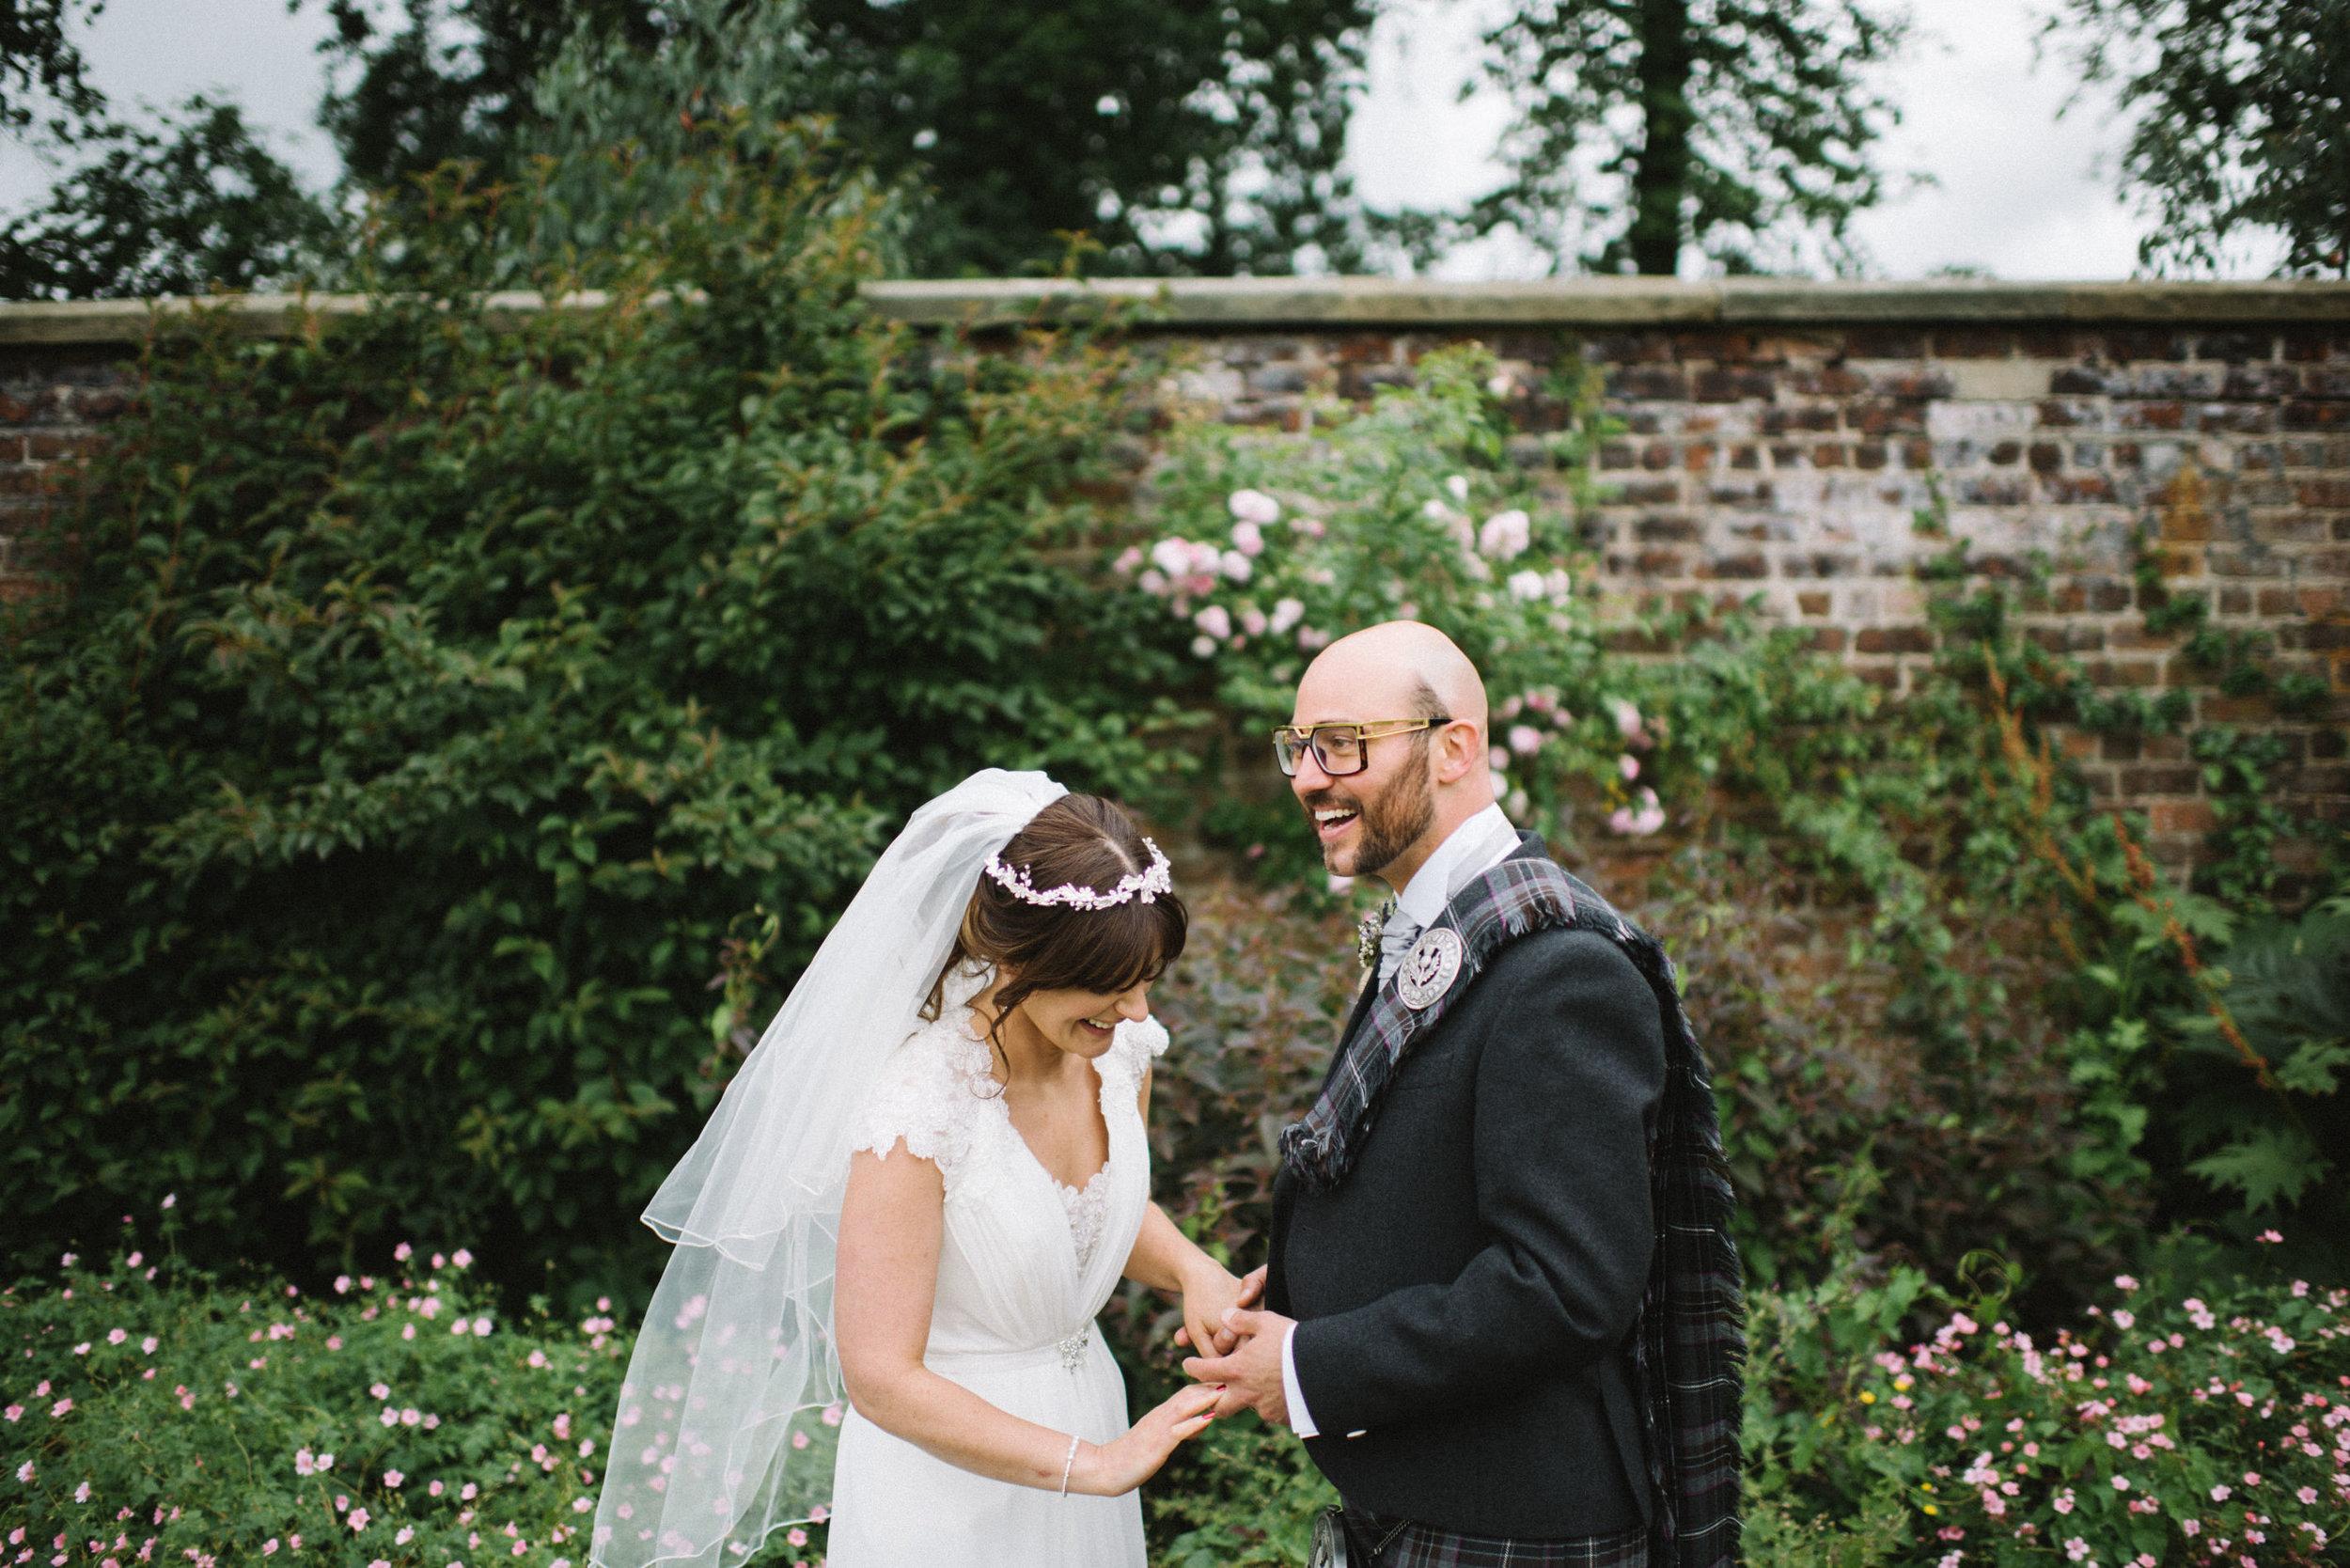 0116-LISA-DEVINE-PHOTOGRAPHY-ALTERNATIVE-WEDDING-PHOTOGRAPHY-SCOTLAND-DESTINATION-WEDDINGS-GLASGOW-WEDDINGS-COOL-WEDDINGS-STYLISH-WEDDINGS.JPG